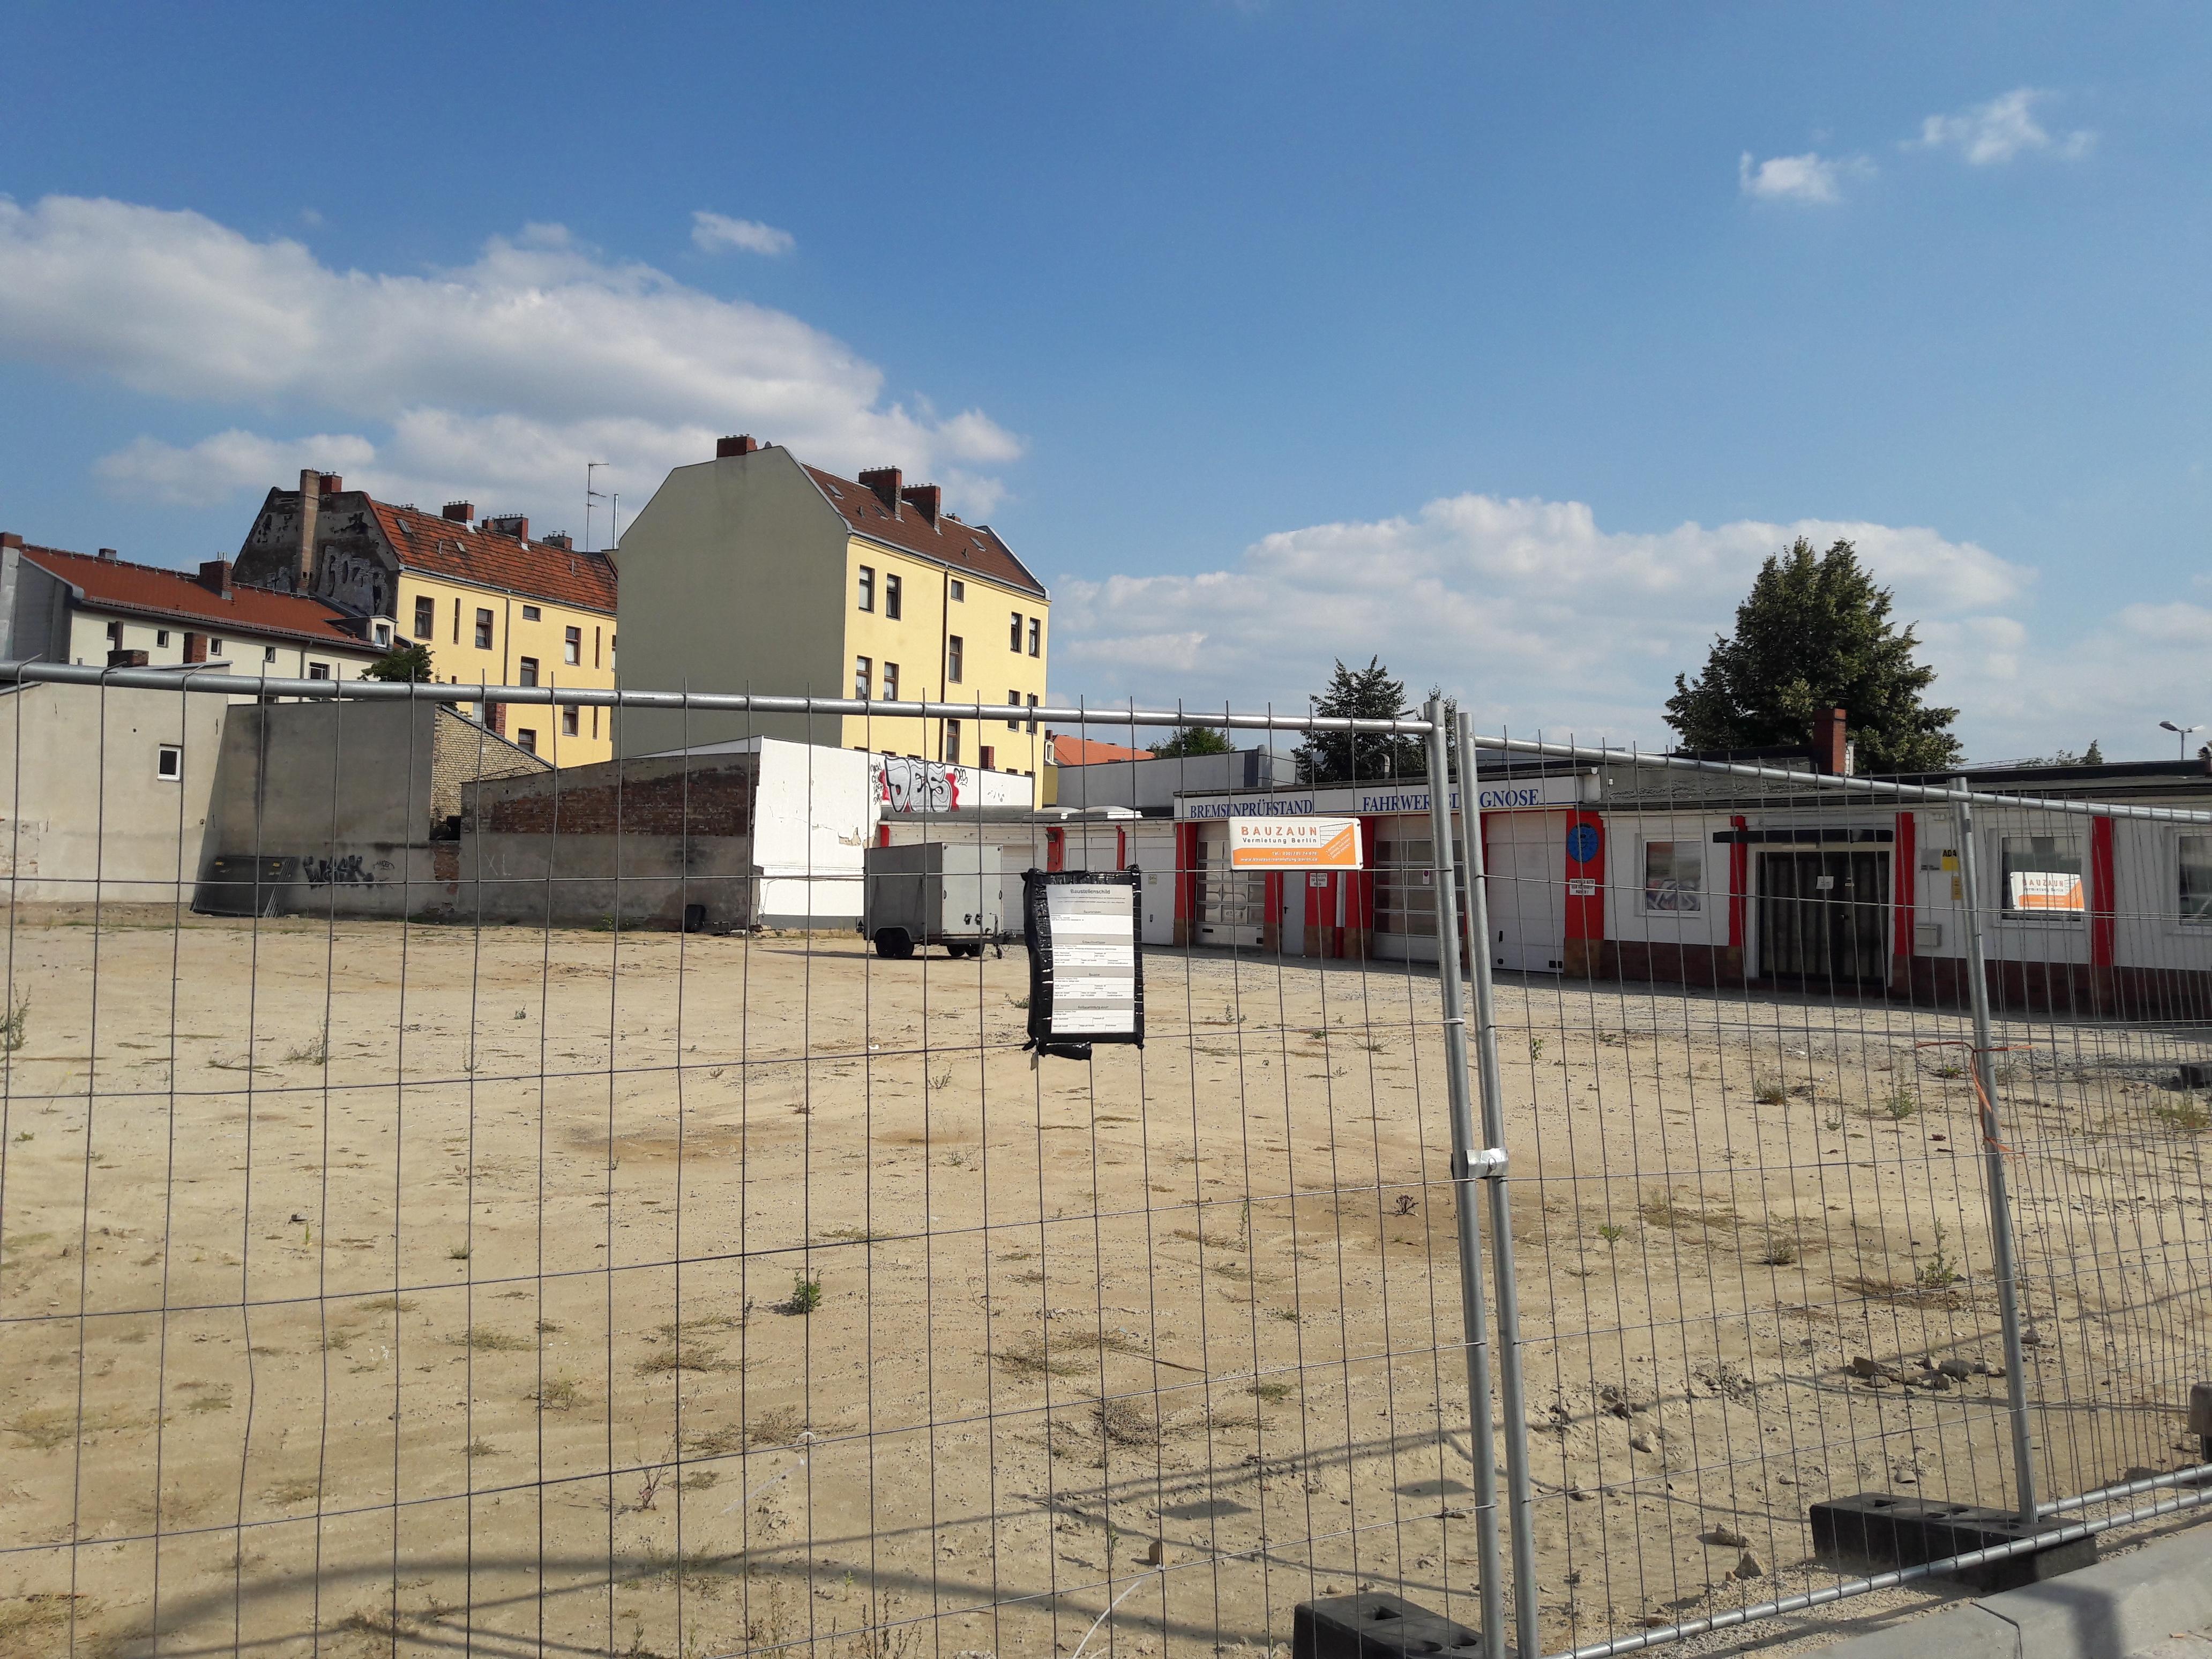 Neubauquartier-Reinickendorf.jpg